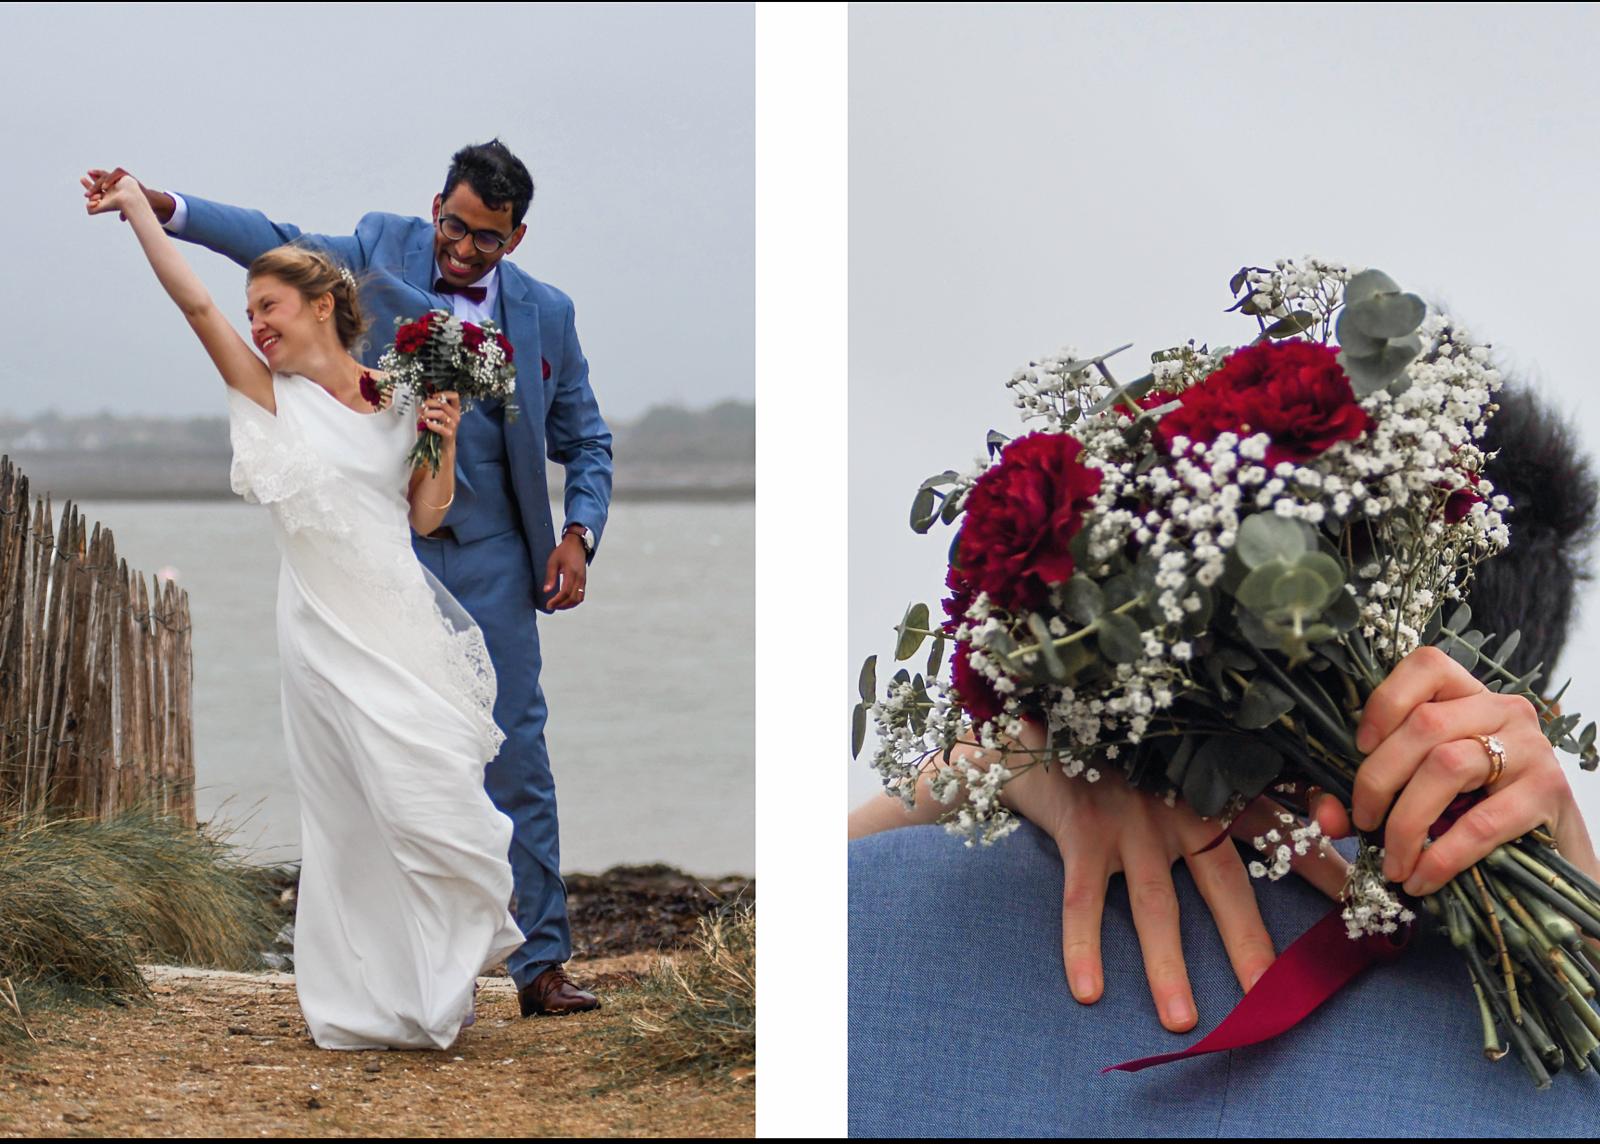 Propose services pour vos photos de mariage